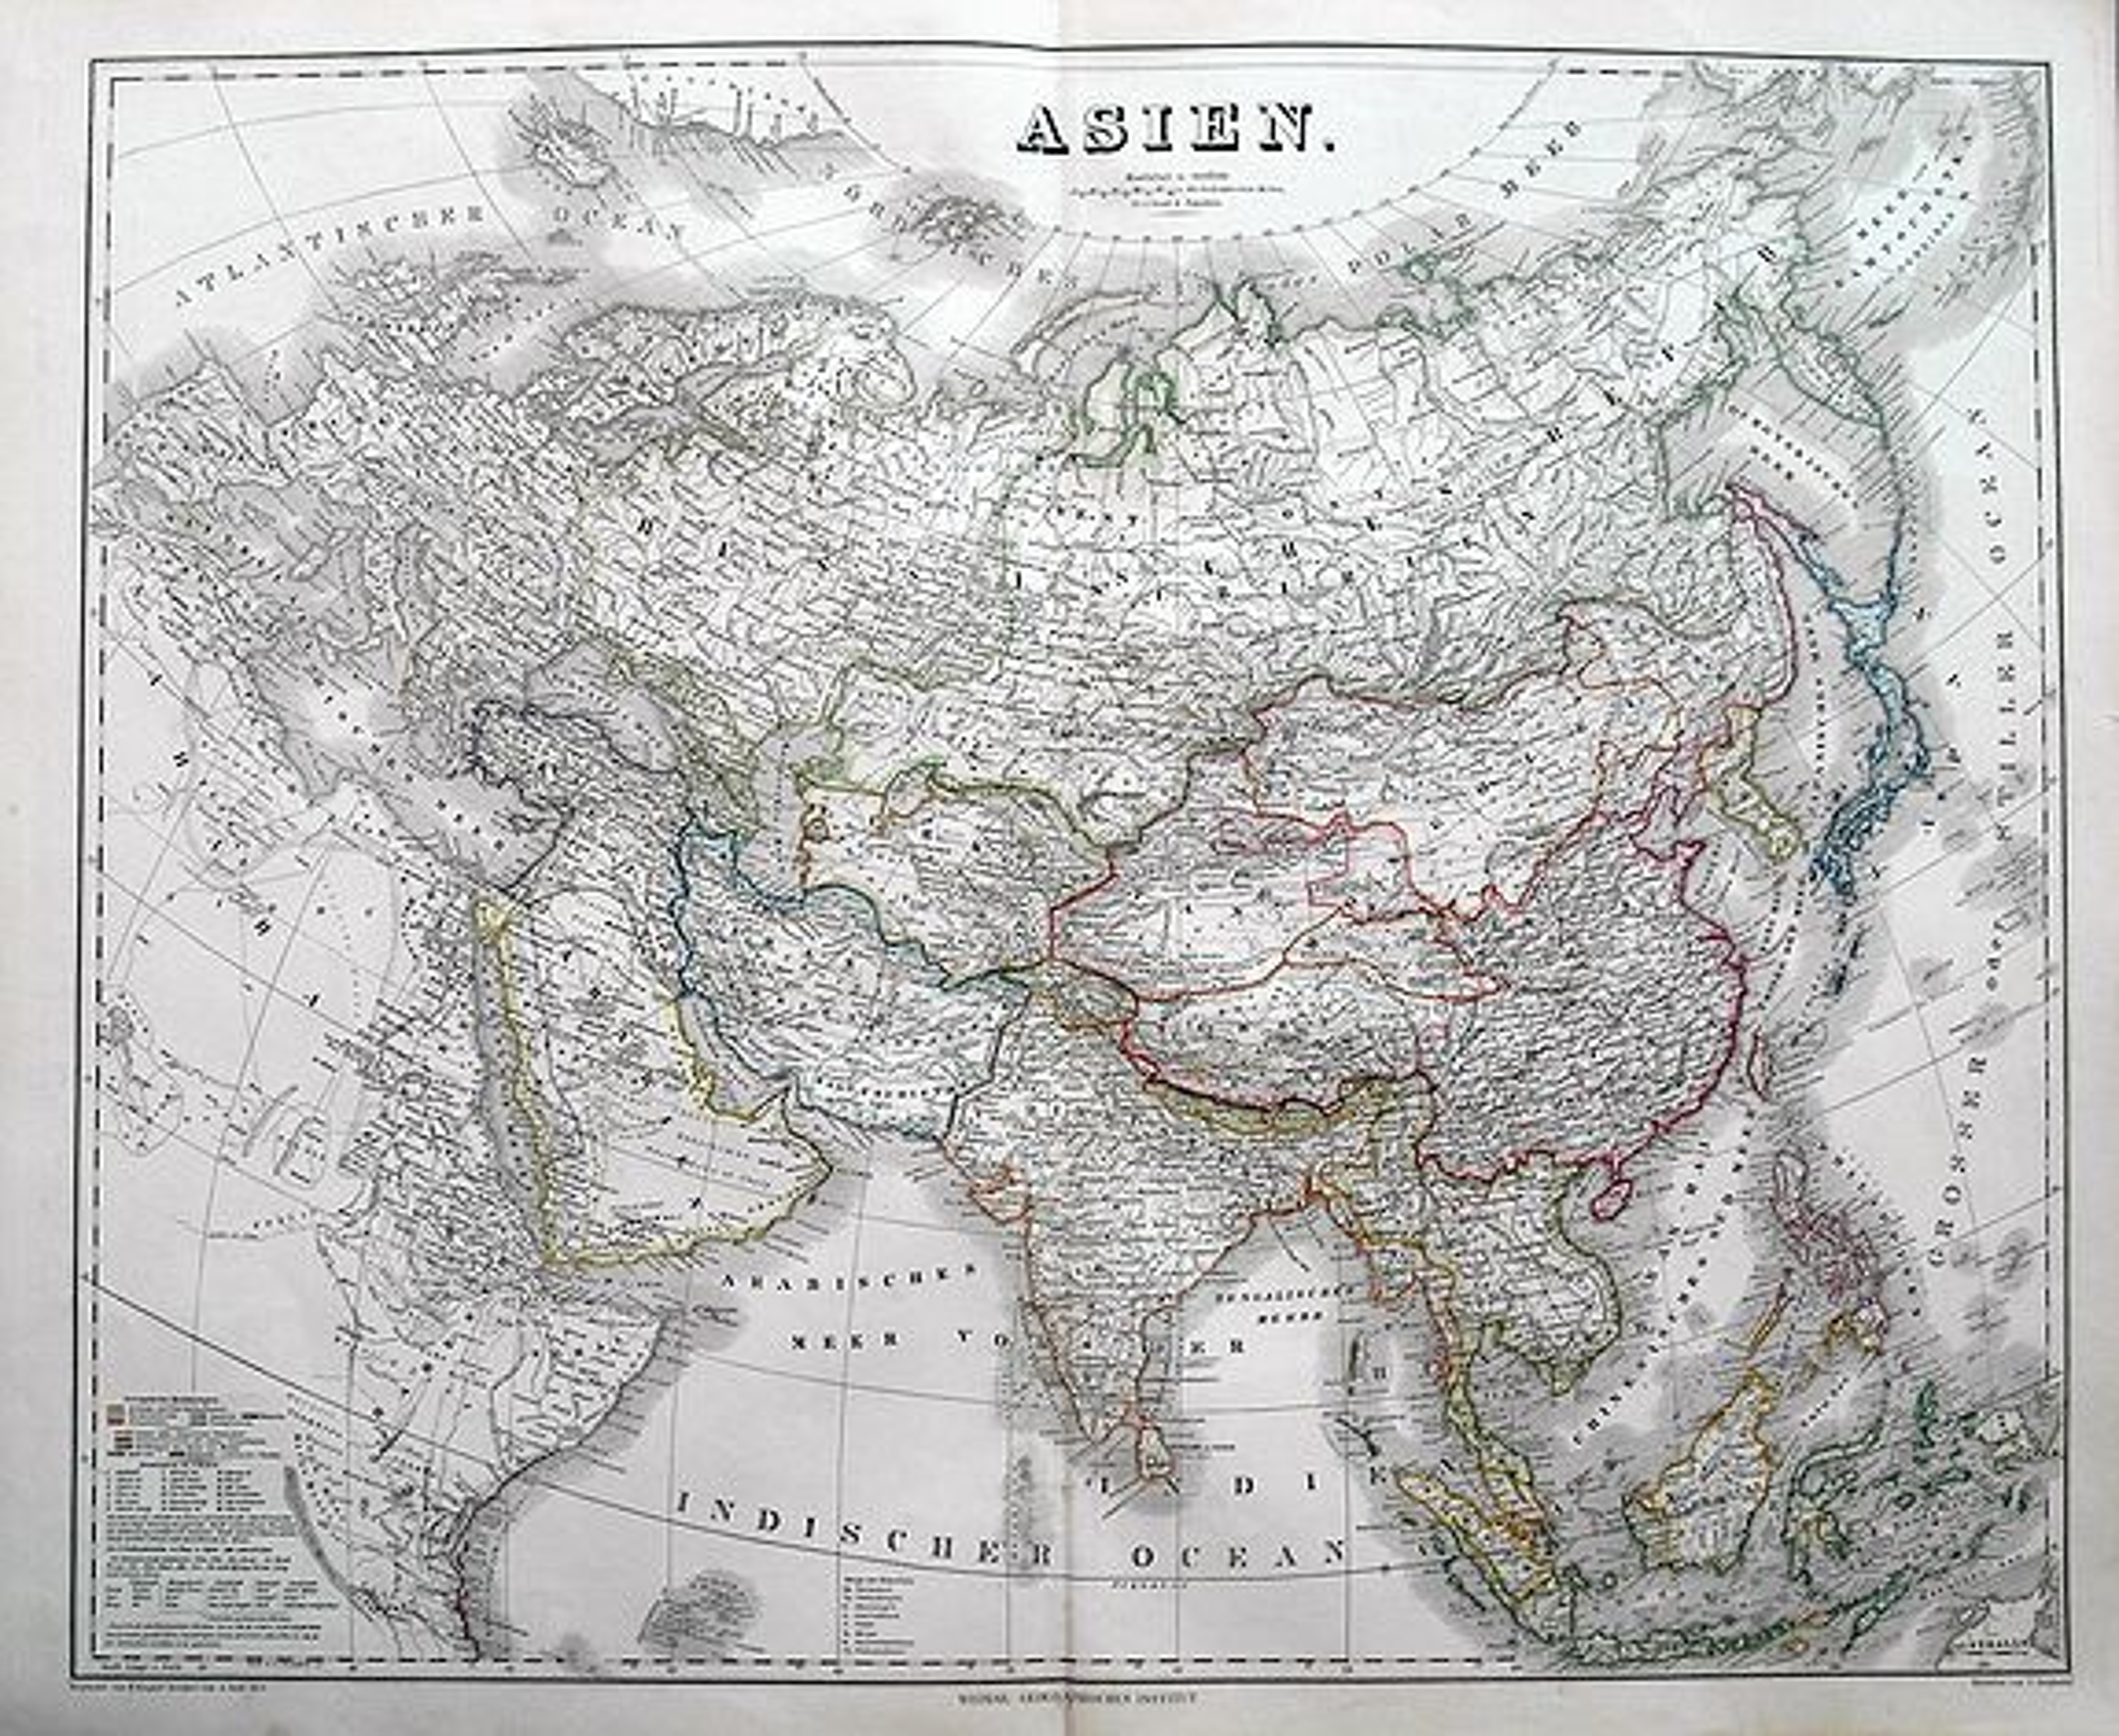 KIEPERT, H. - Asien.